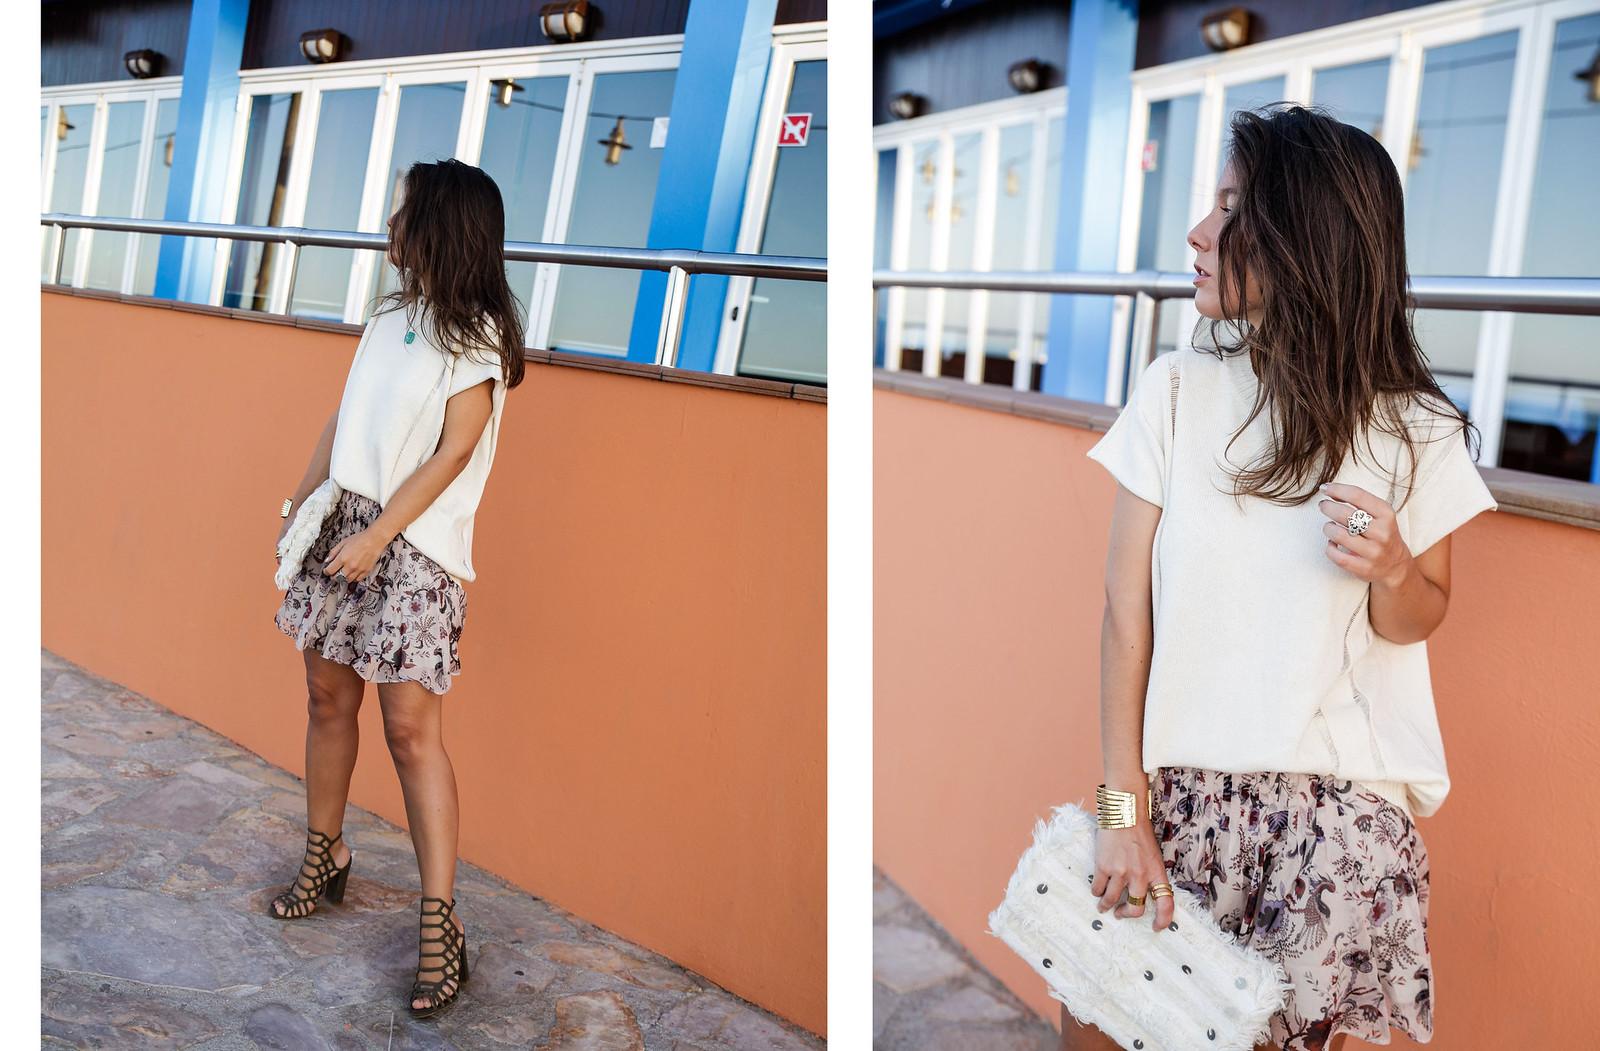 04_blusa_punto_falda_flores_summer_outfit_theguestgirl_rüga_schade_jewels_steve_madden_.magali_pasacal_influencer_barcelona_blogger